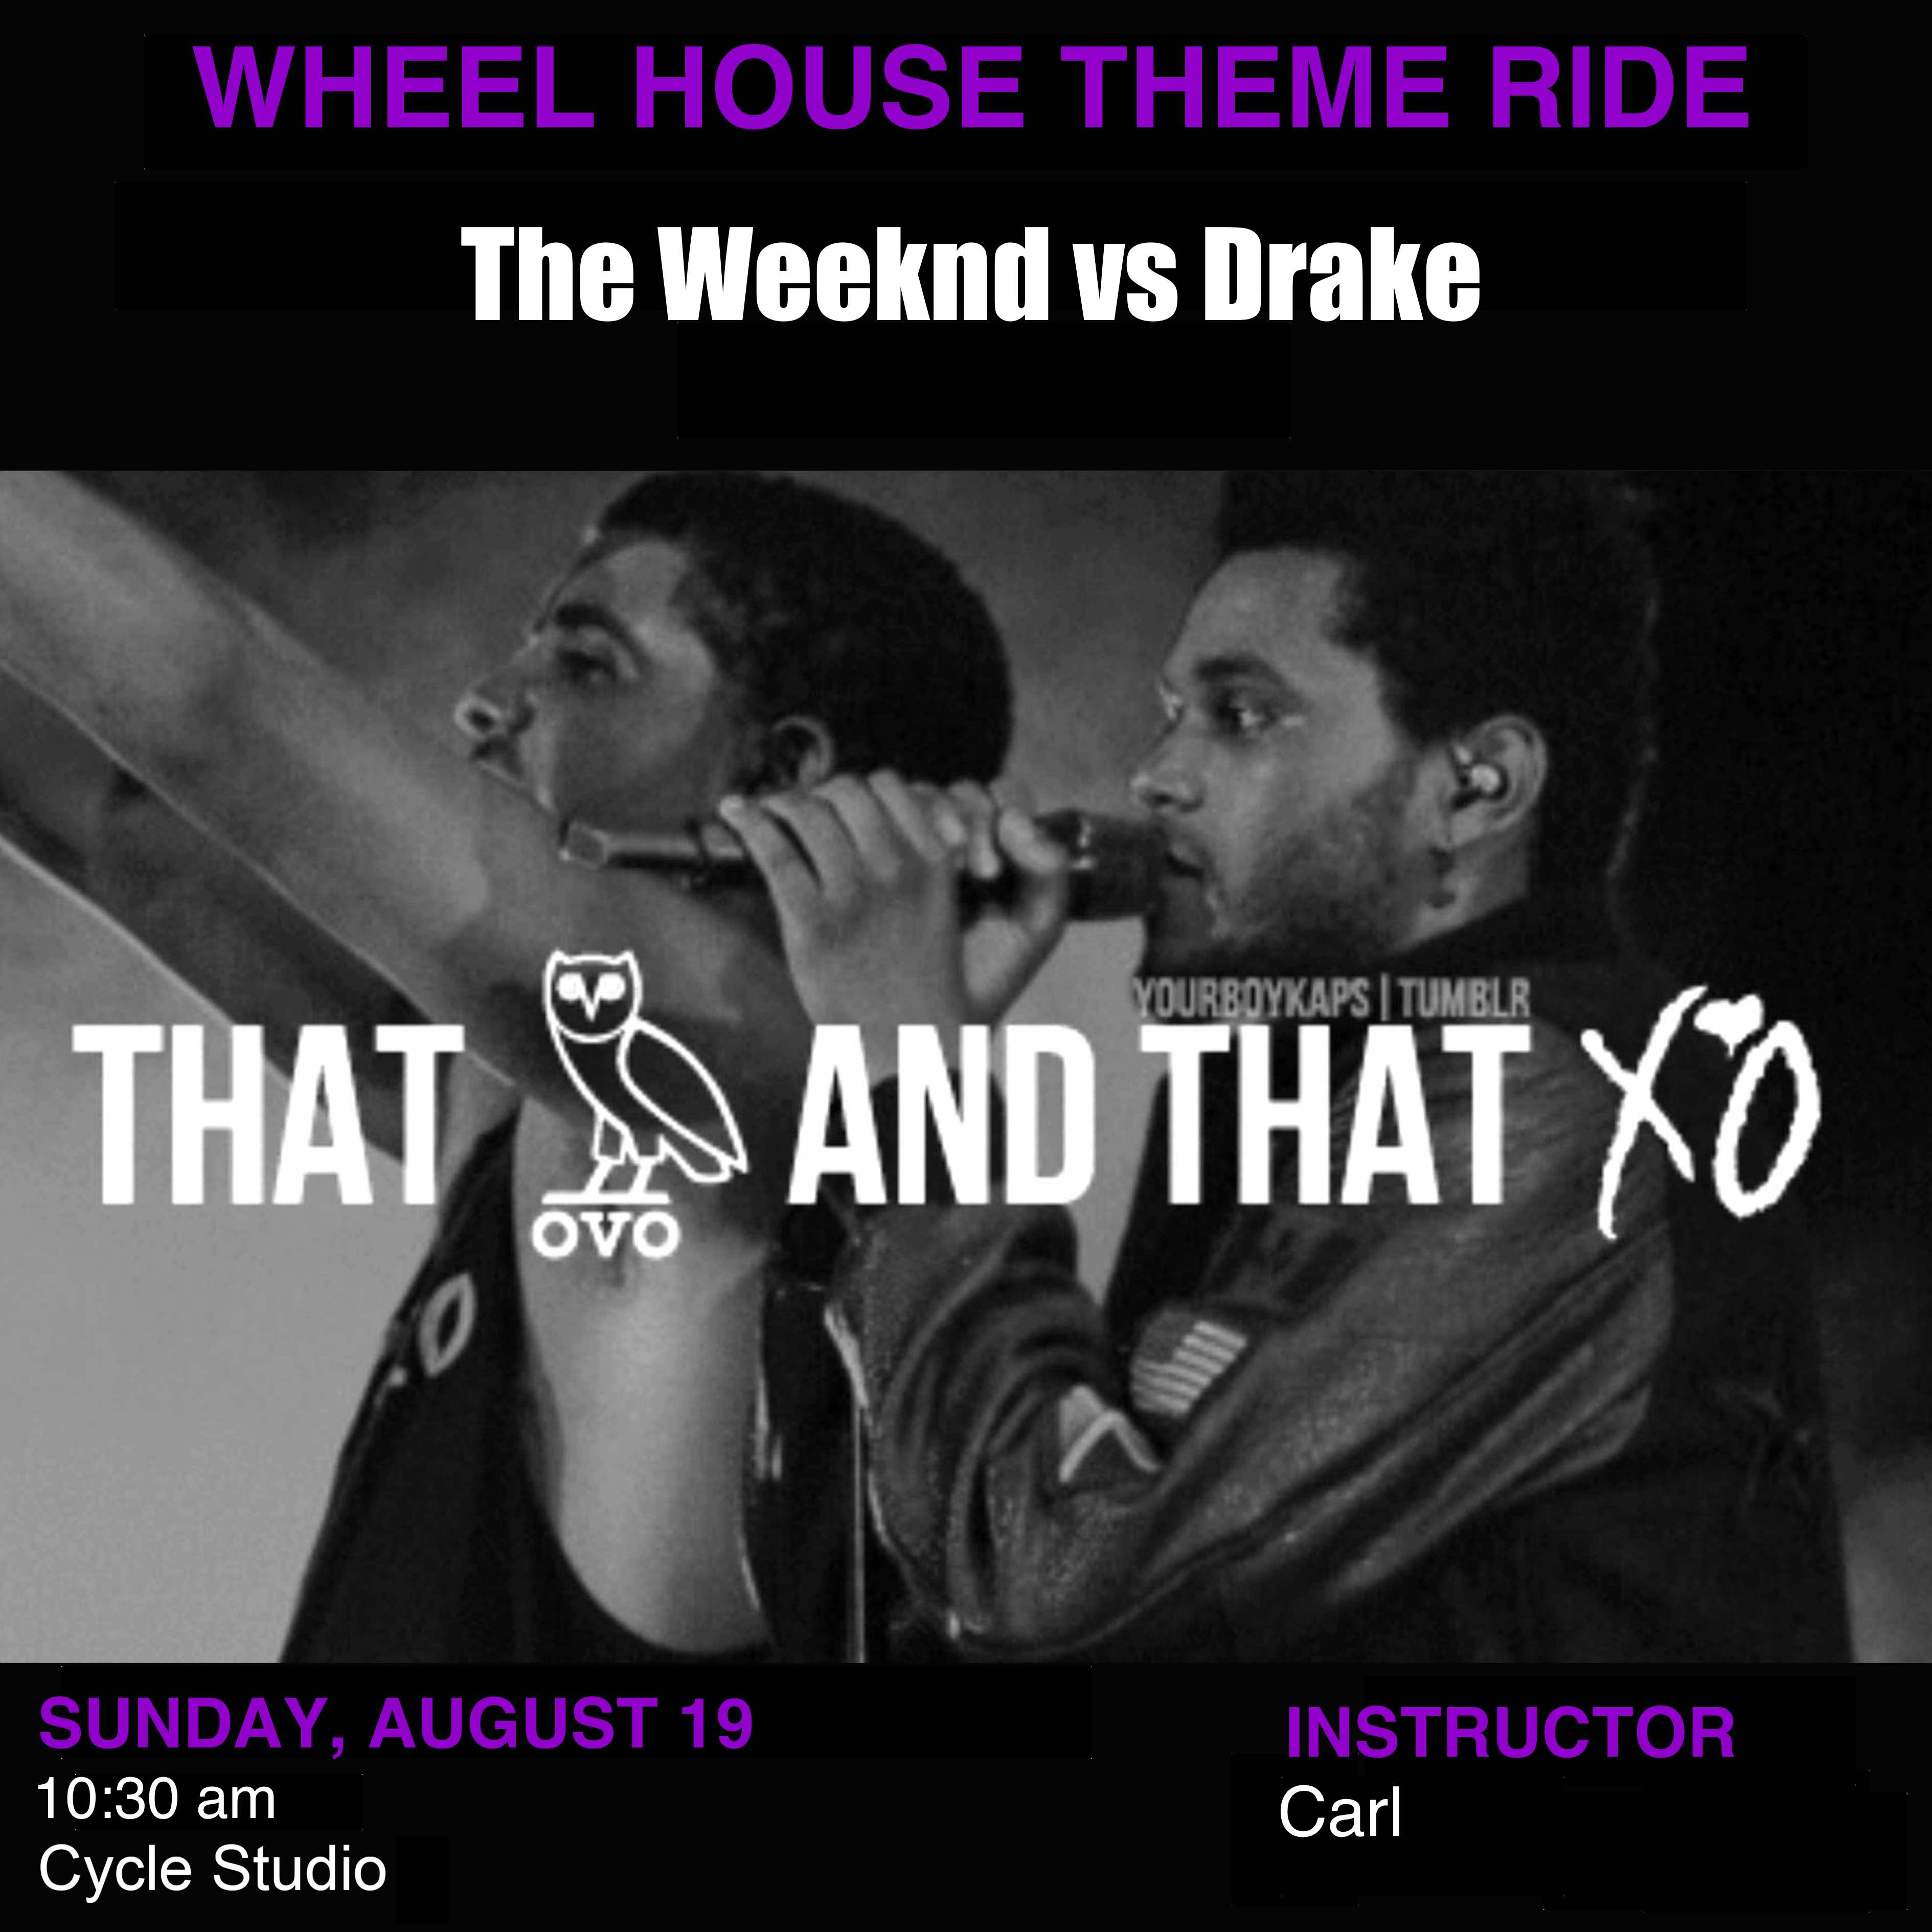 The Weeknd vs Drake